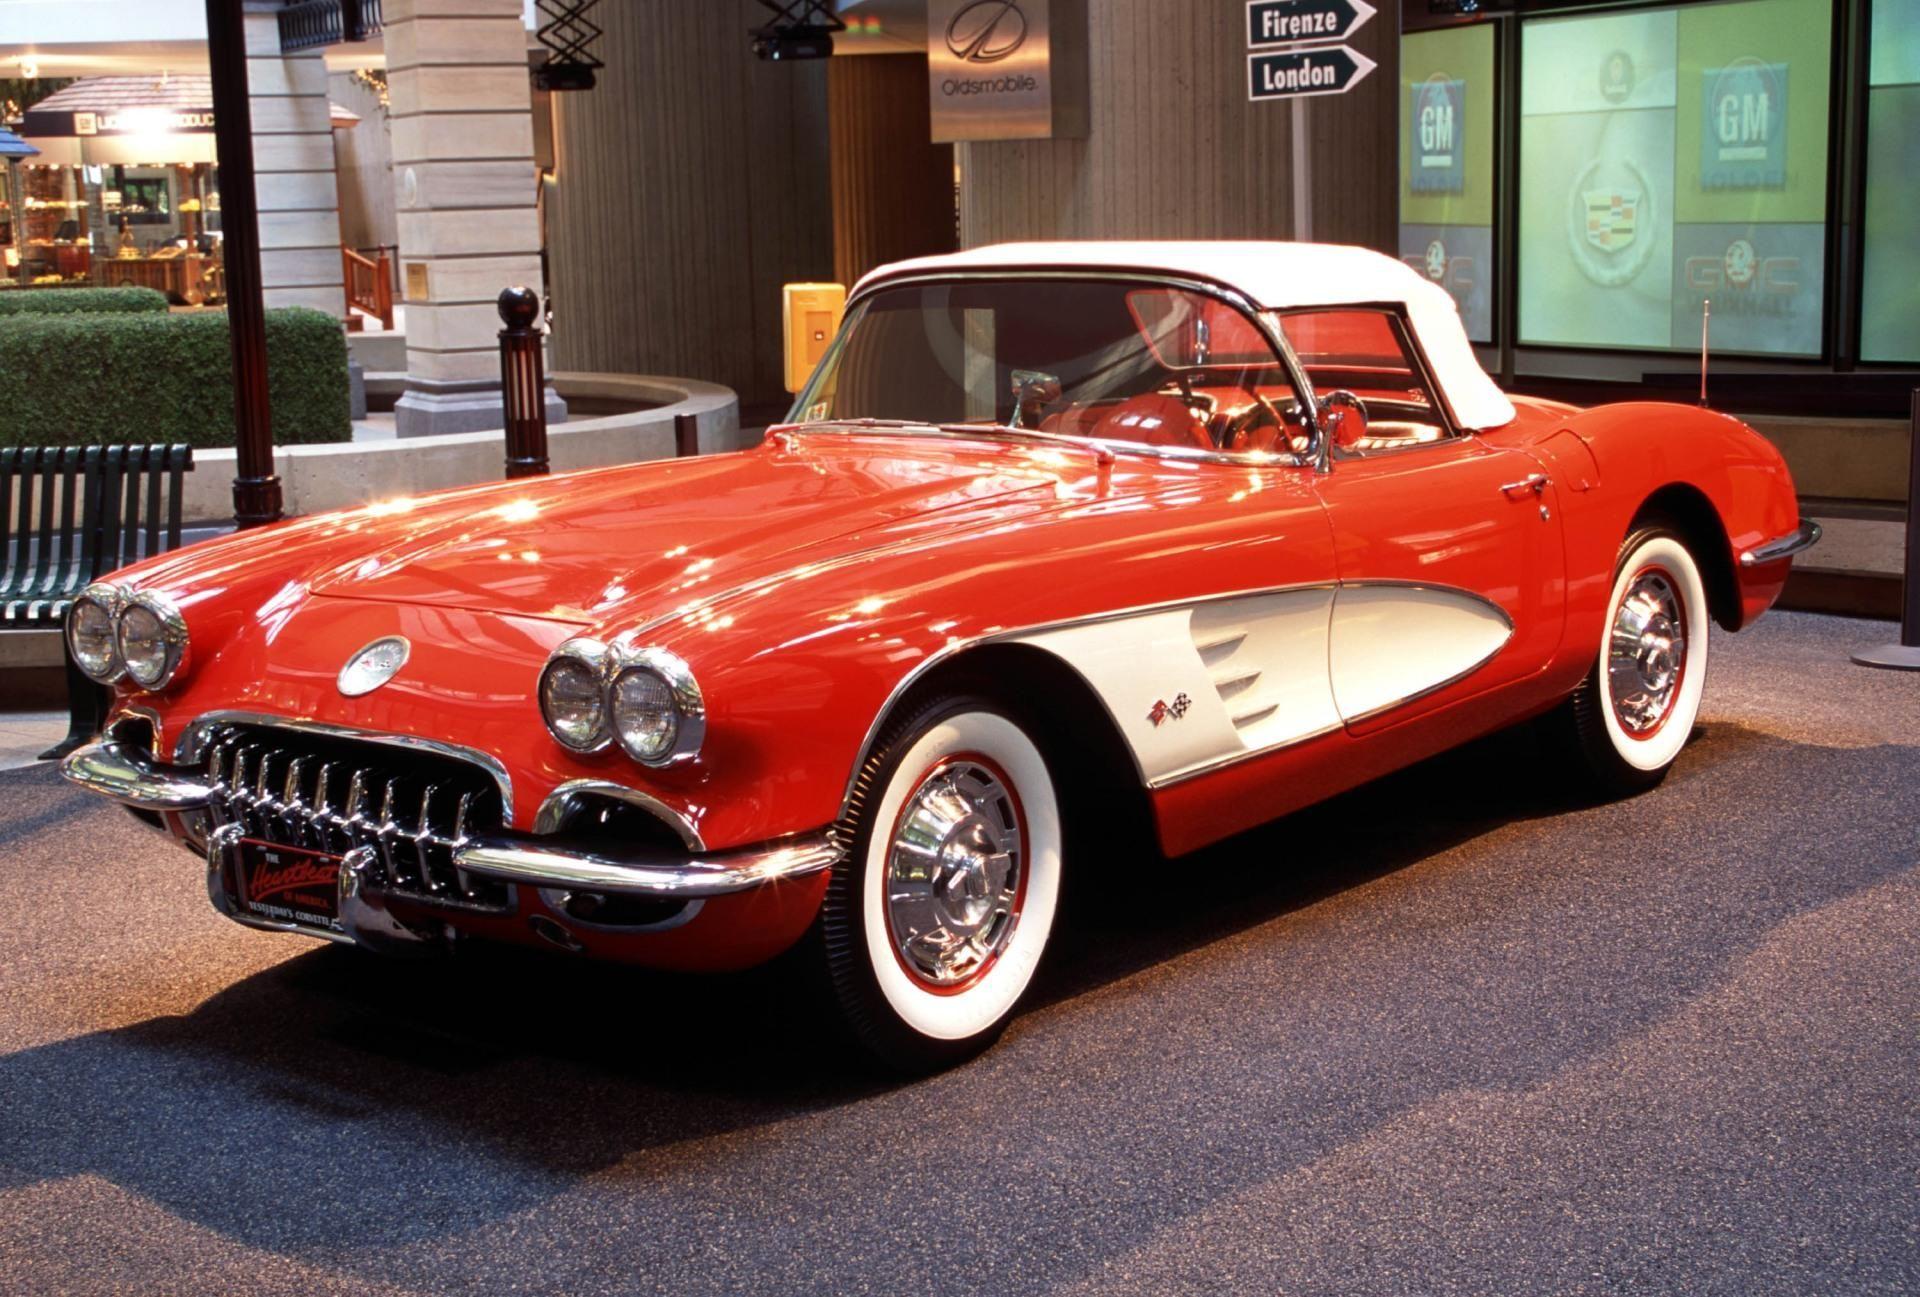 1960 corvette | Home : Vehicles : 1960 Chevrolet Corvette C1 ...